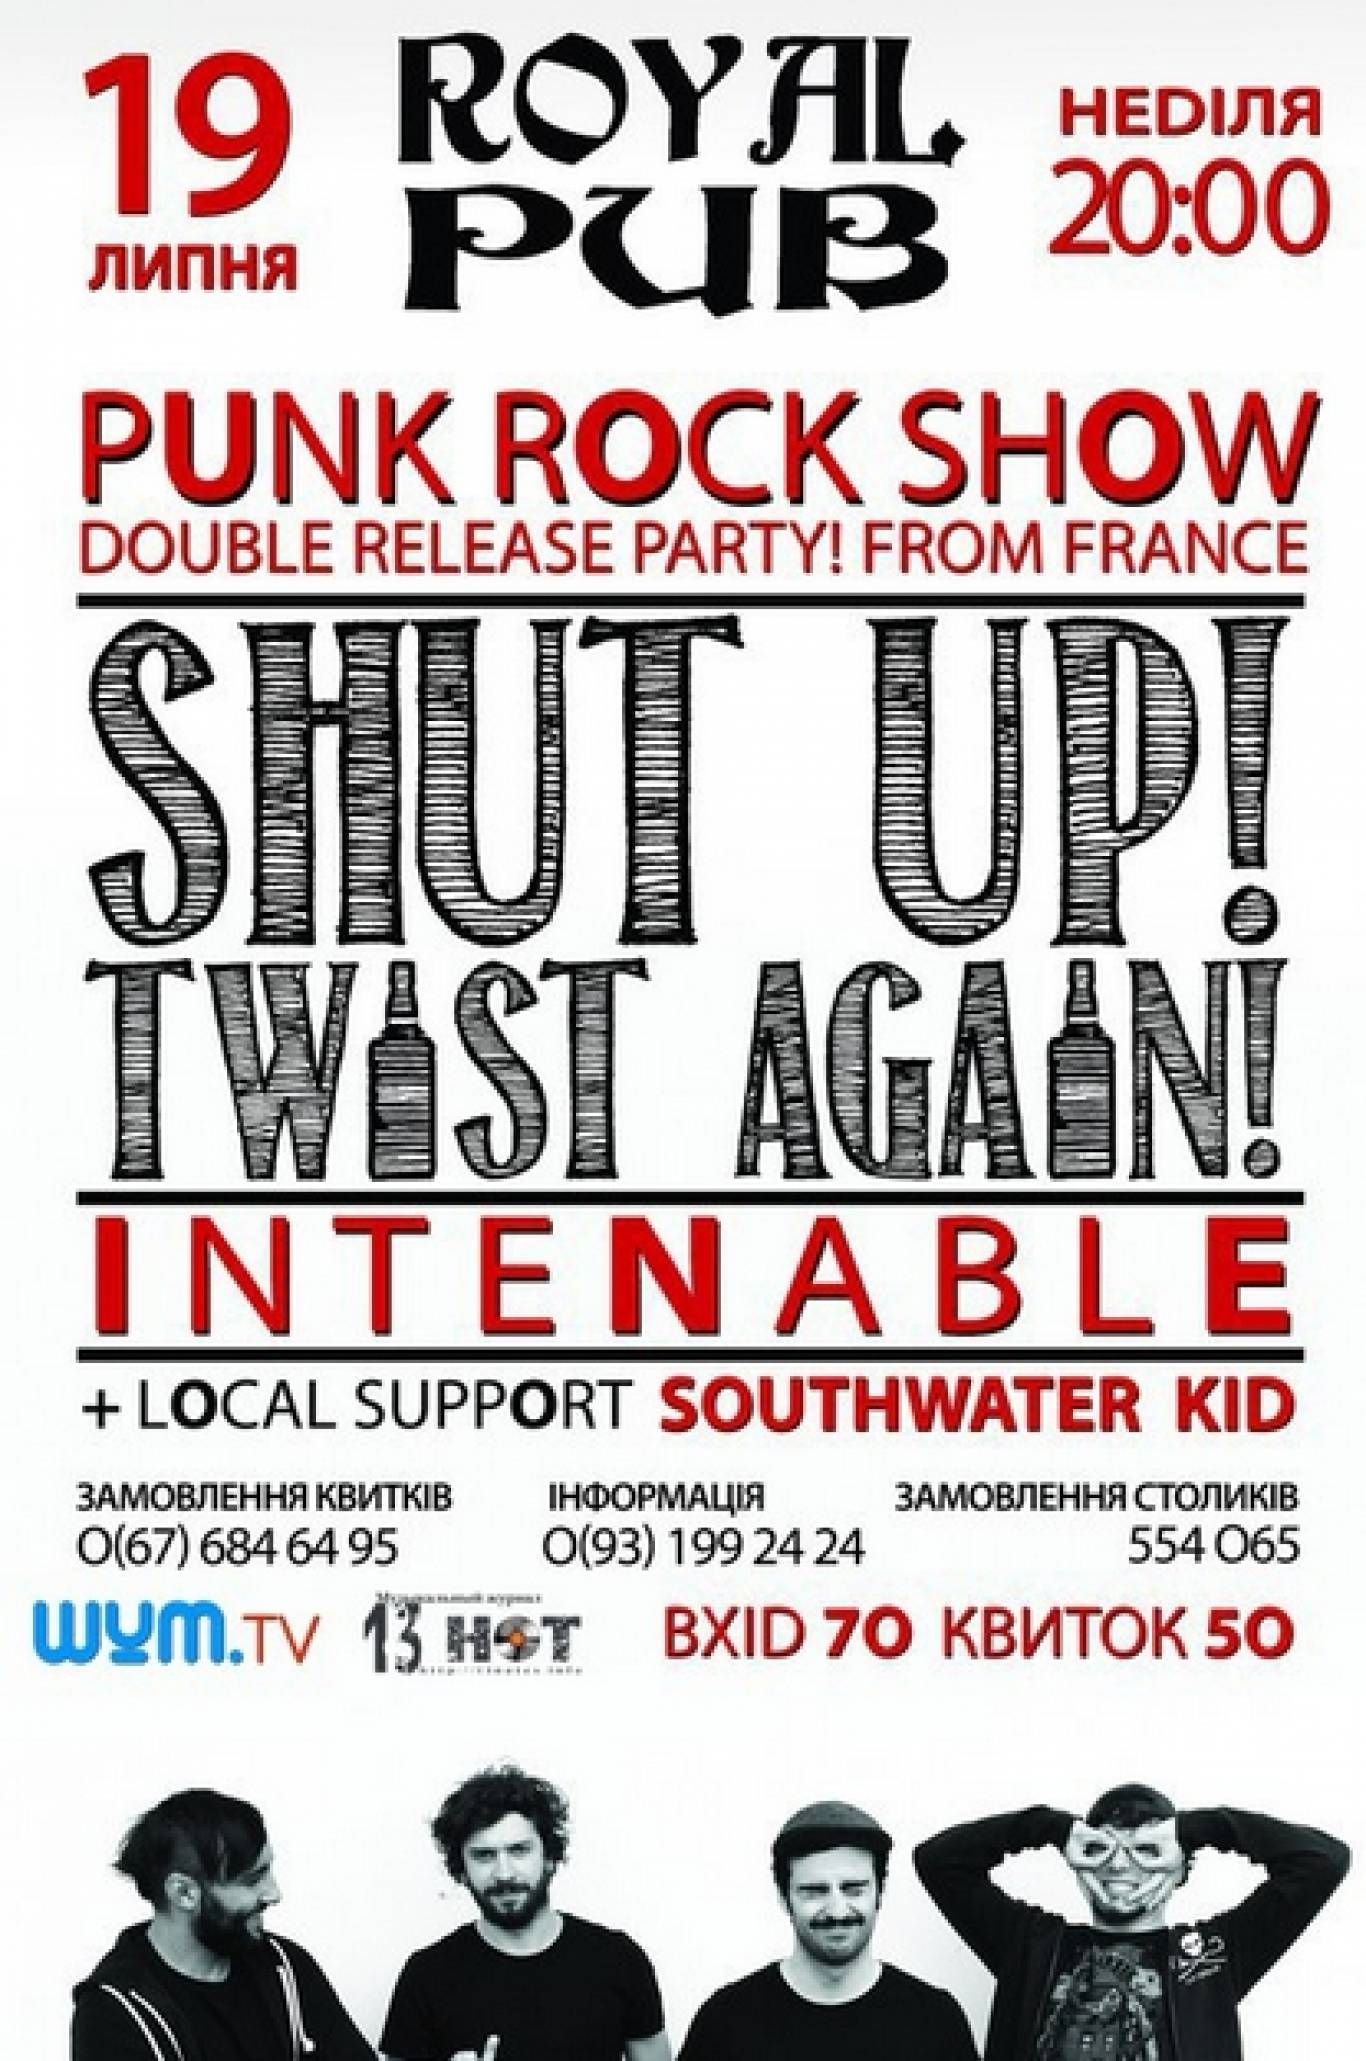 Концерт драйвових гуртів: SHUT UP! TWIST AGAIN! & INTENABLE